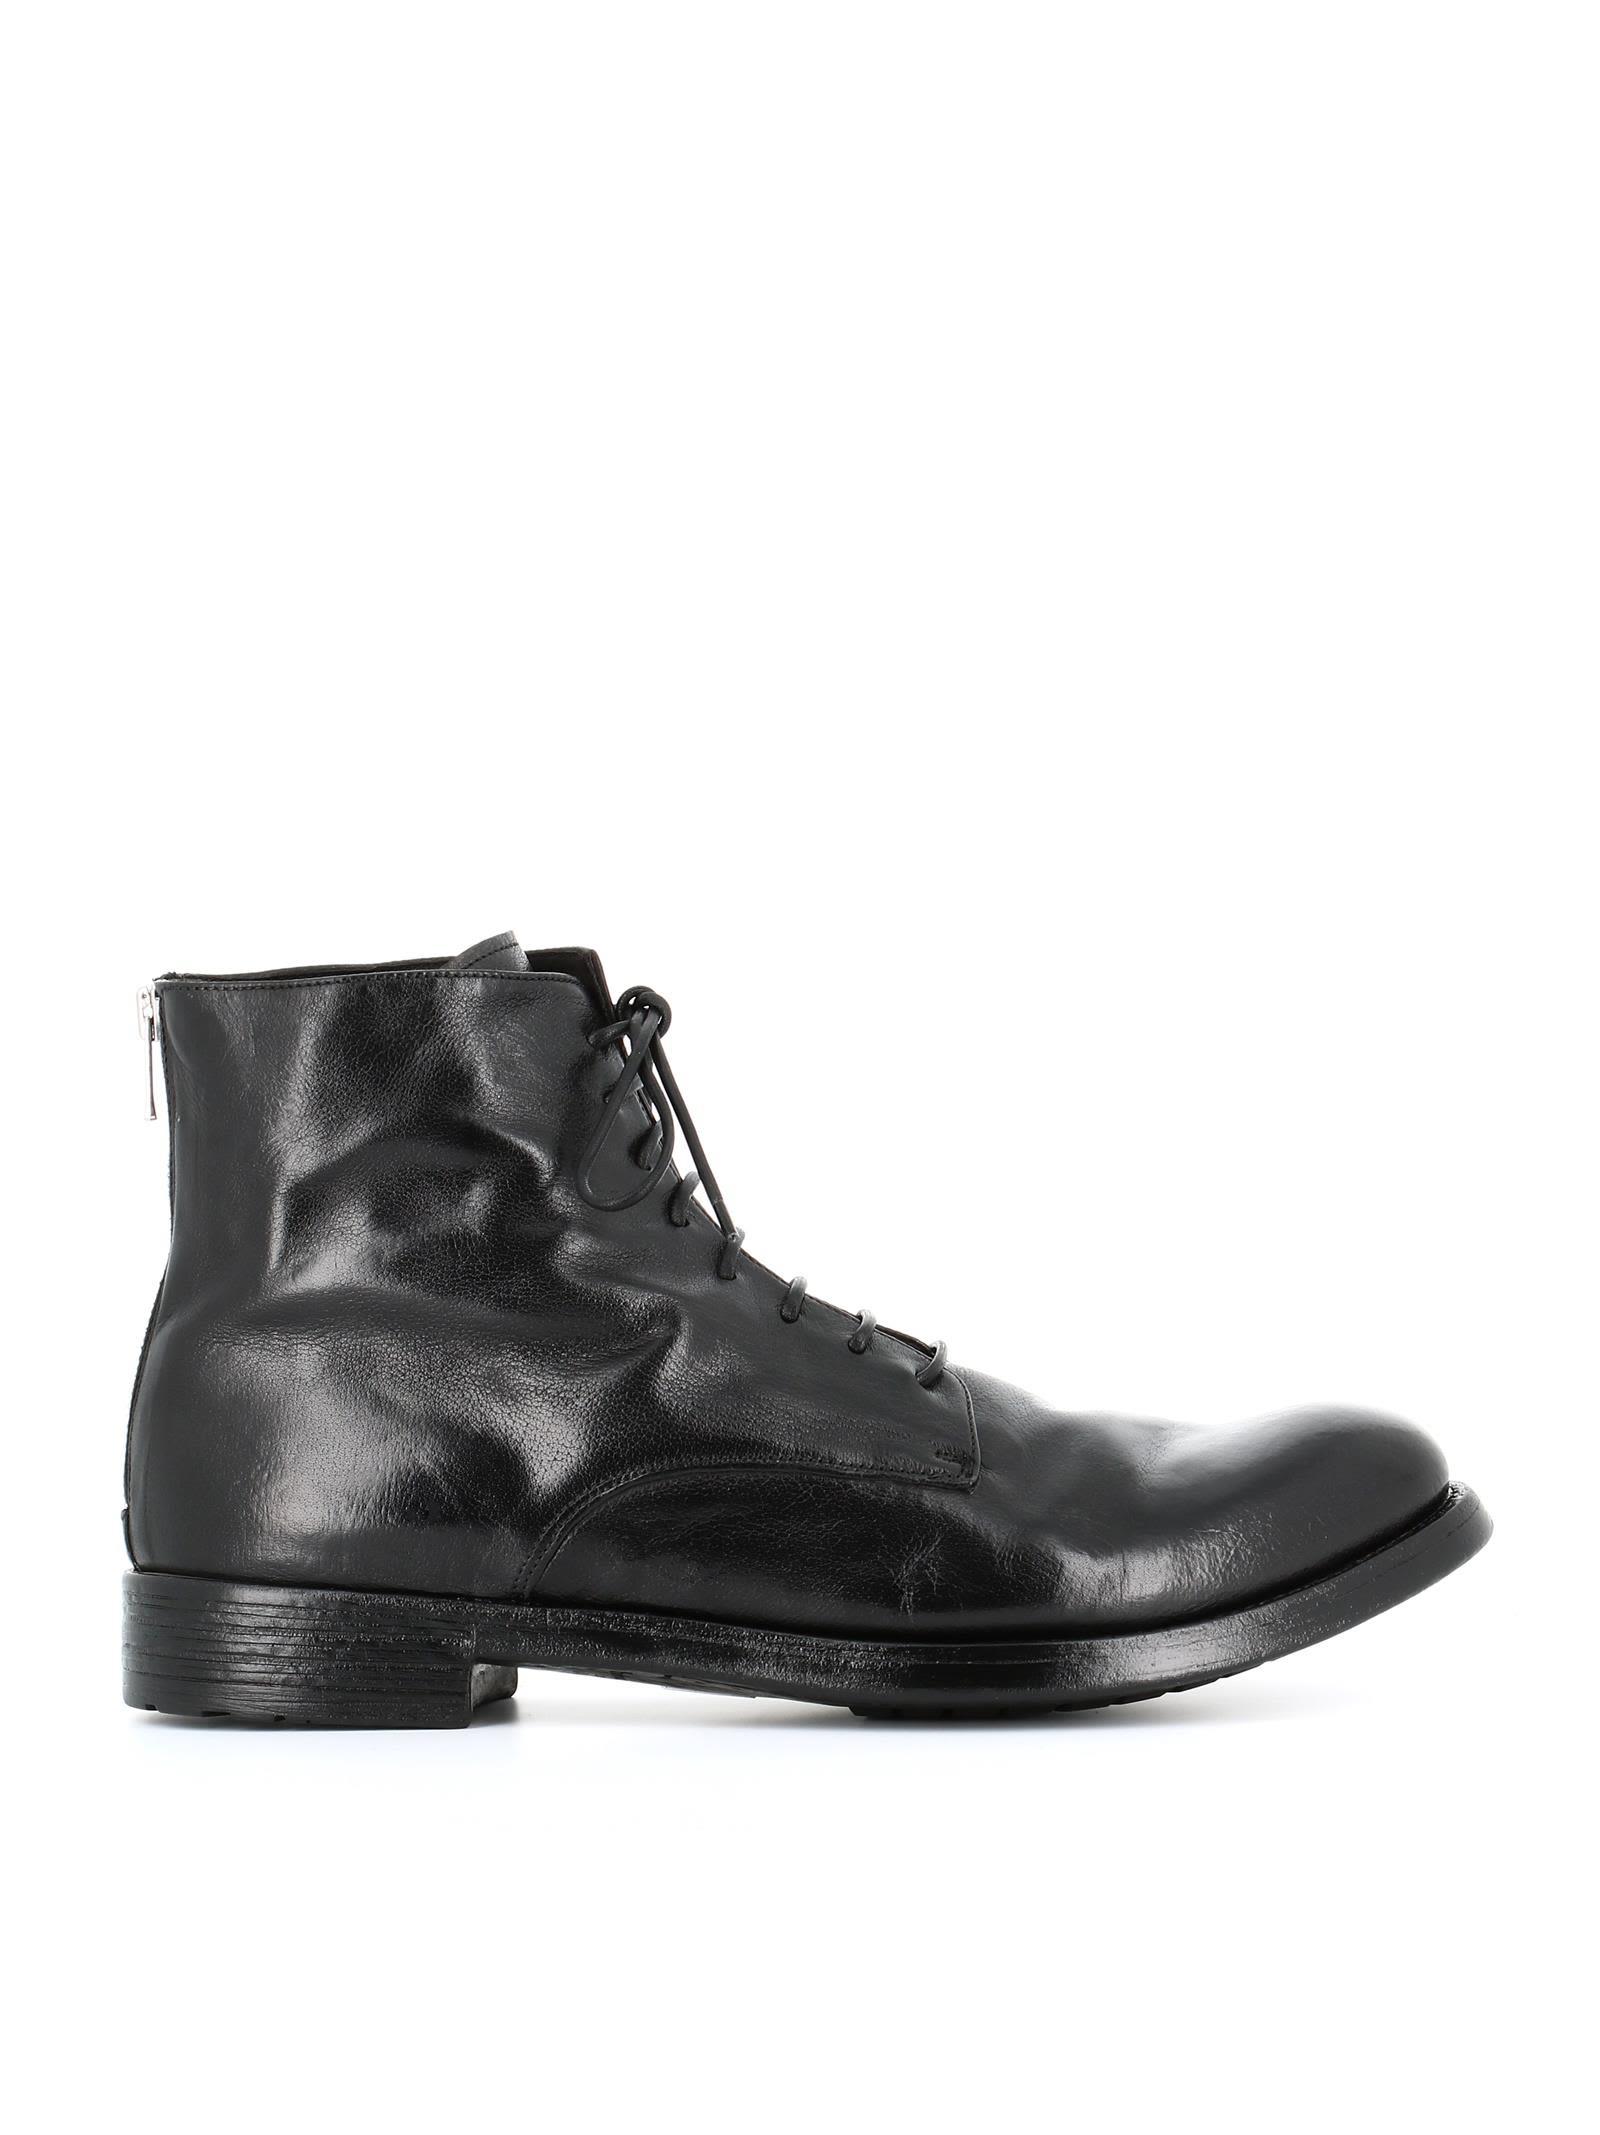 competitive price 2b69a 5c44c Officine Creative botas Hive Negro 47 EU Zapatos elnegro elnegro Zapatos  3cb823